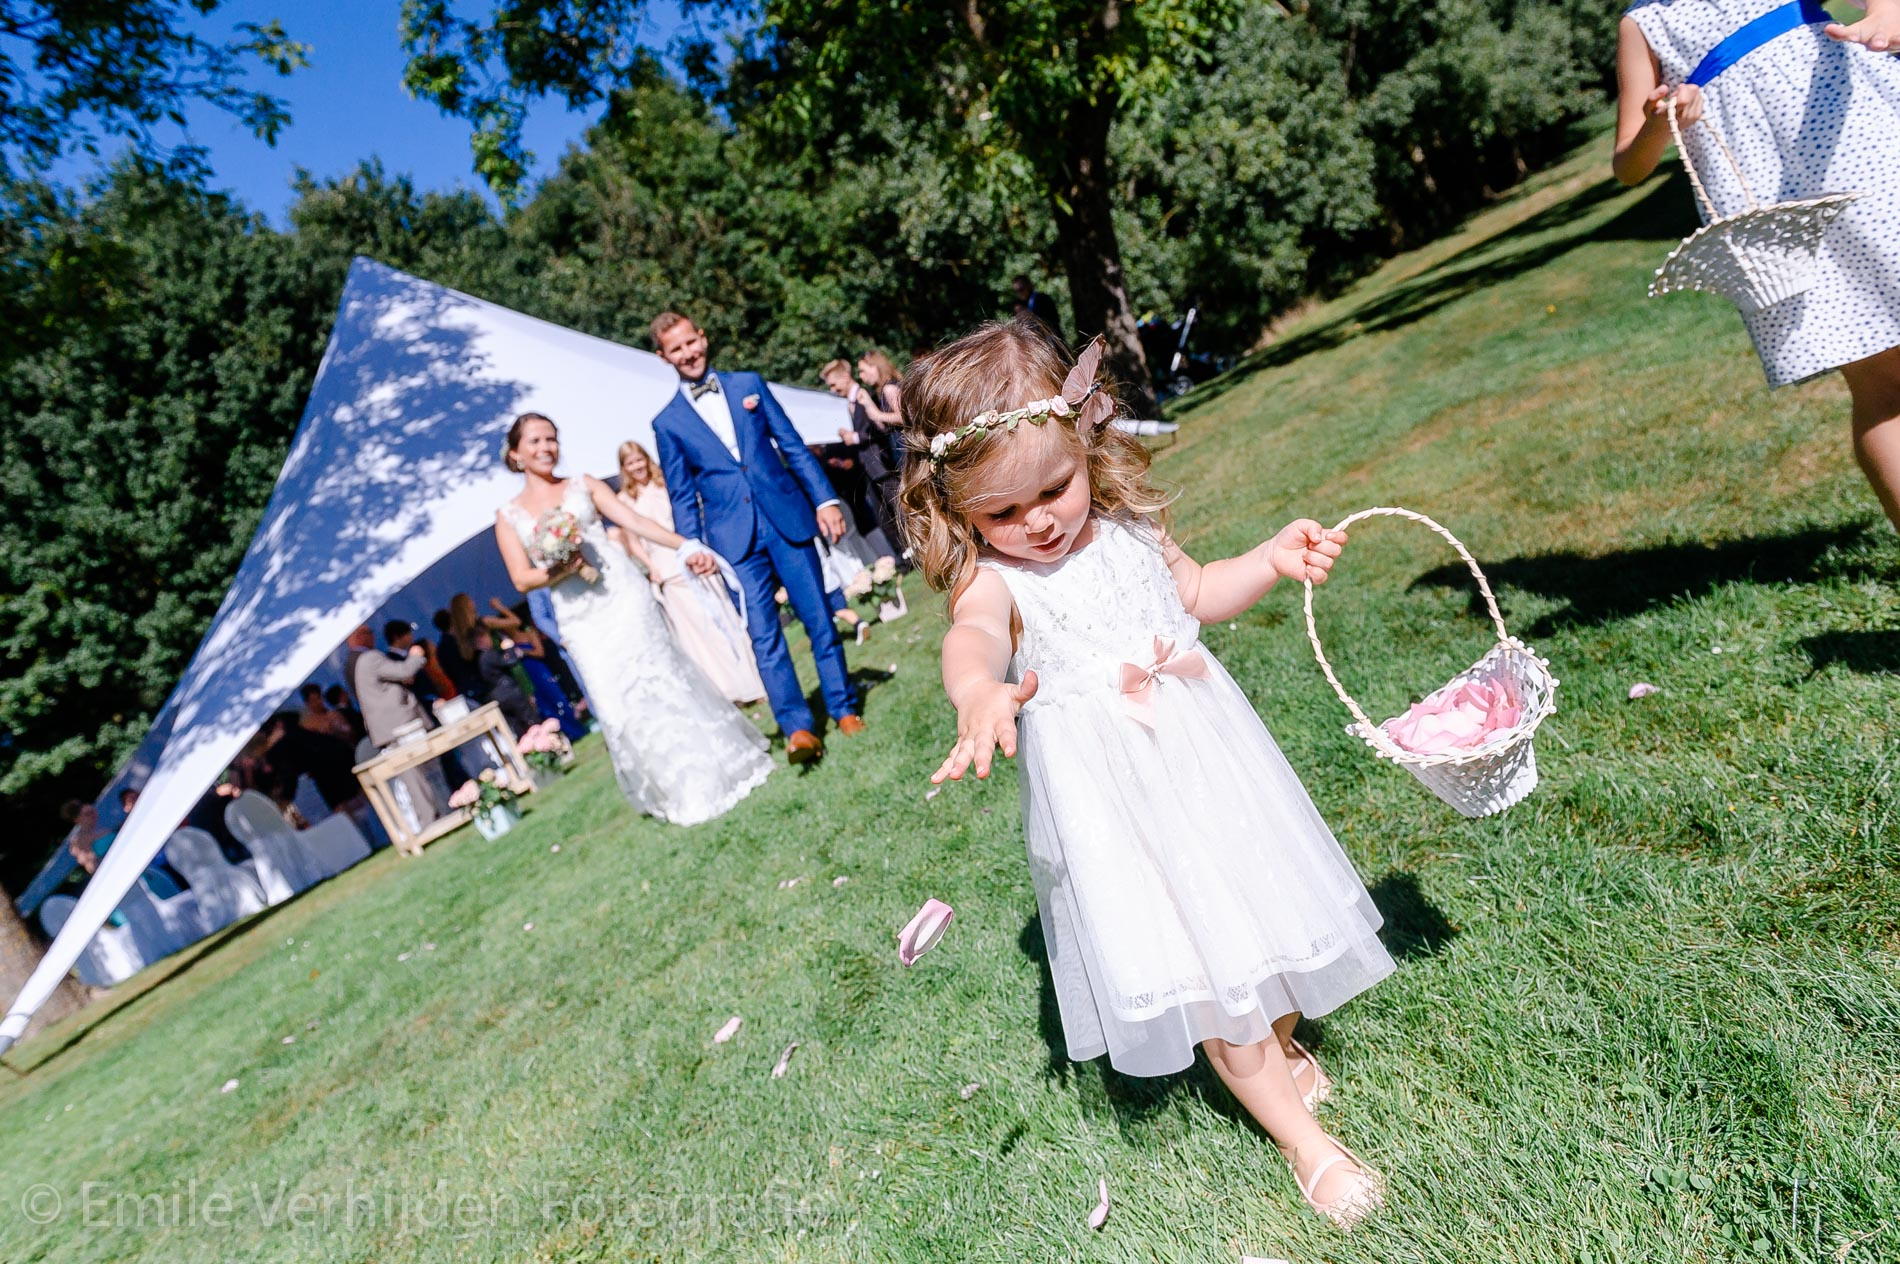 Bruidsmeisje strooit blaadjes- Bruidsfotografie Winselerhof Landgraaf - Kerkrade